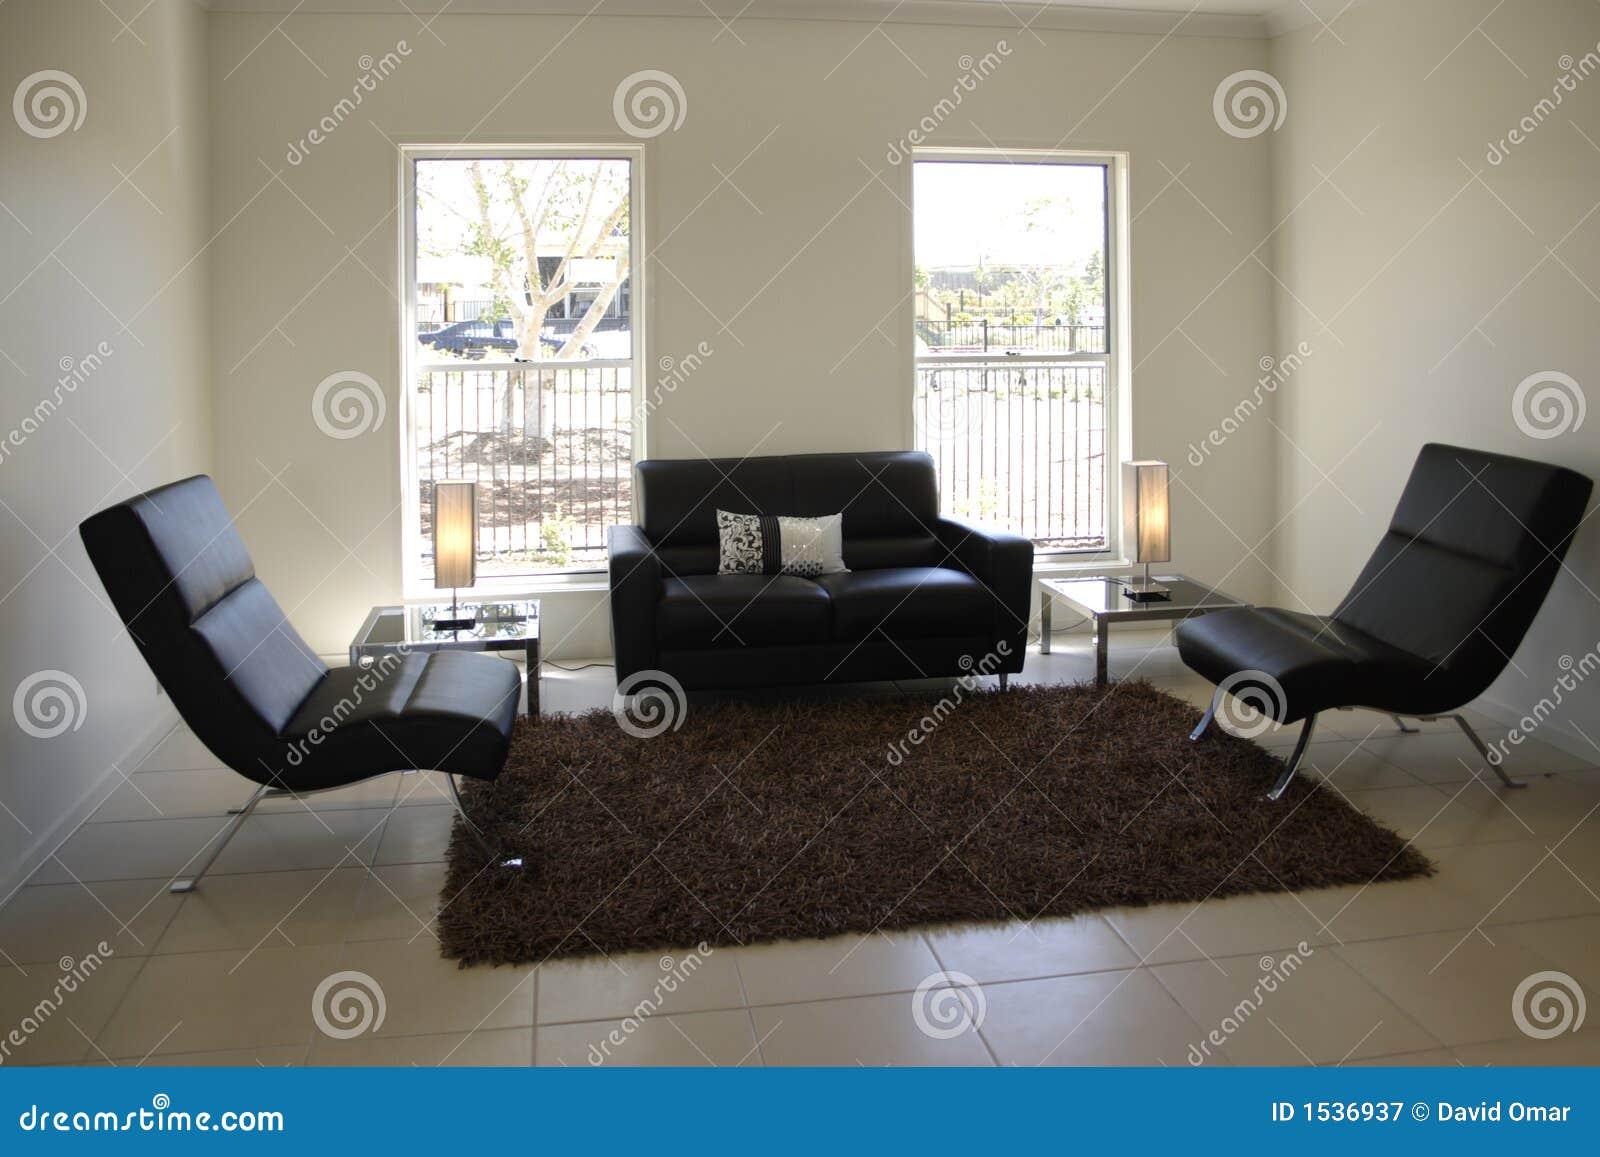 Feng Shui - Sitting Room